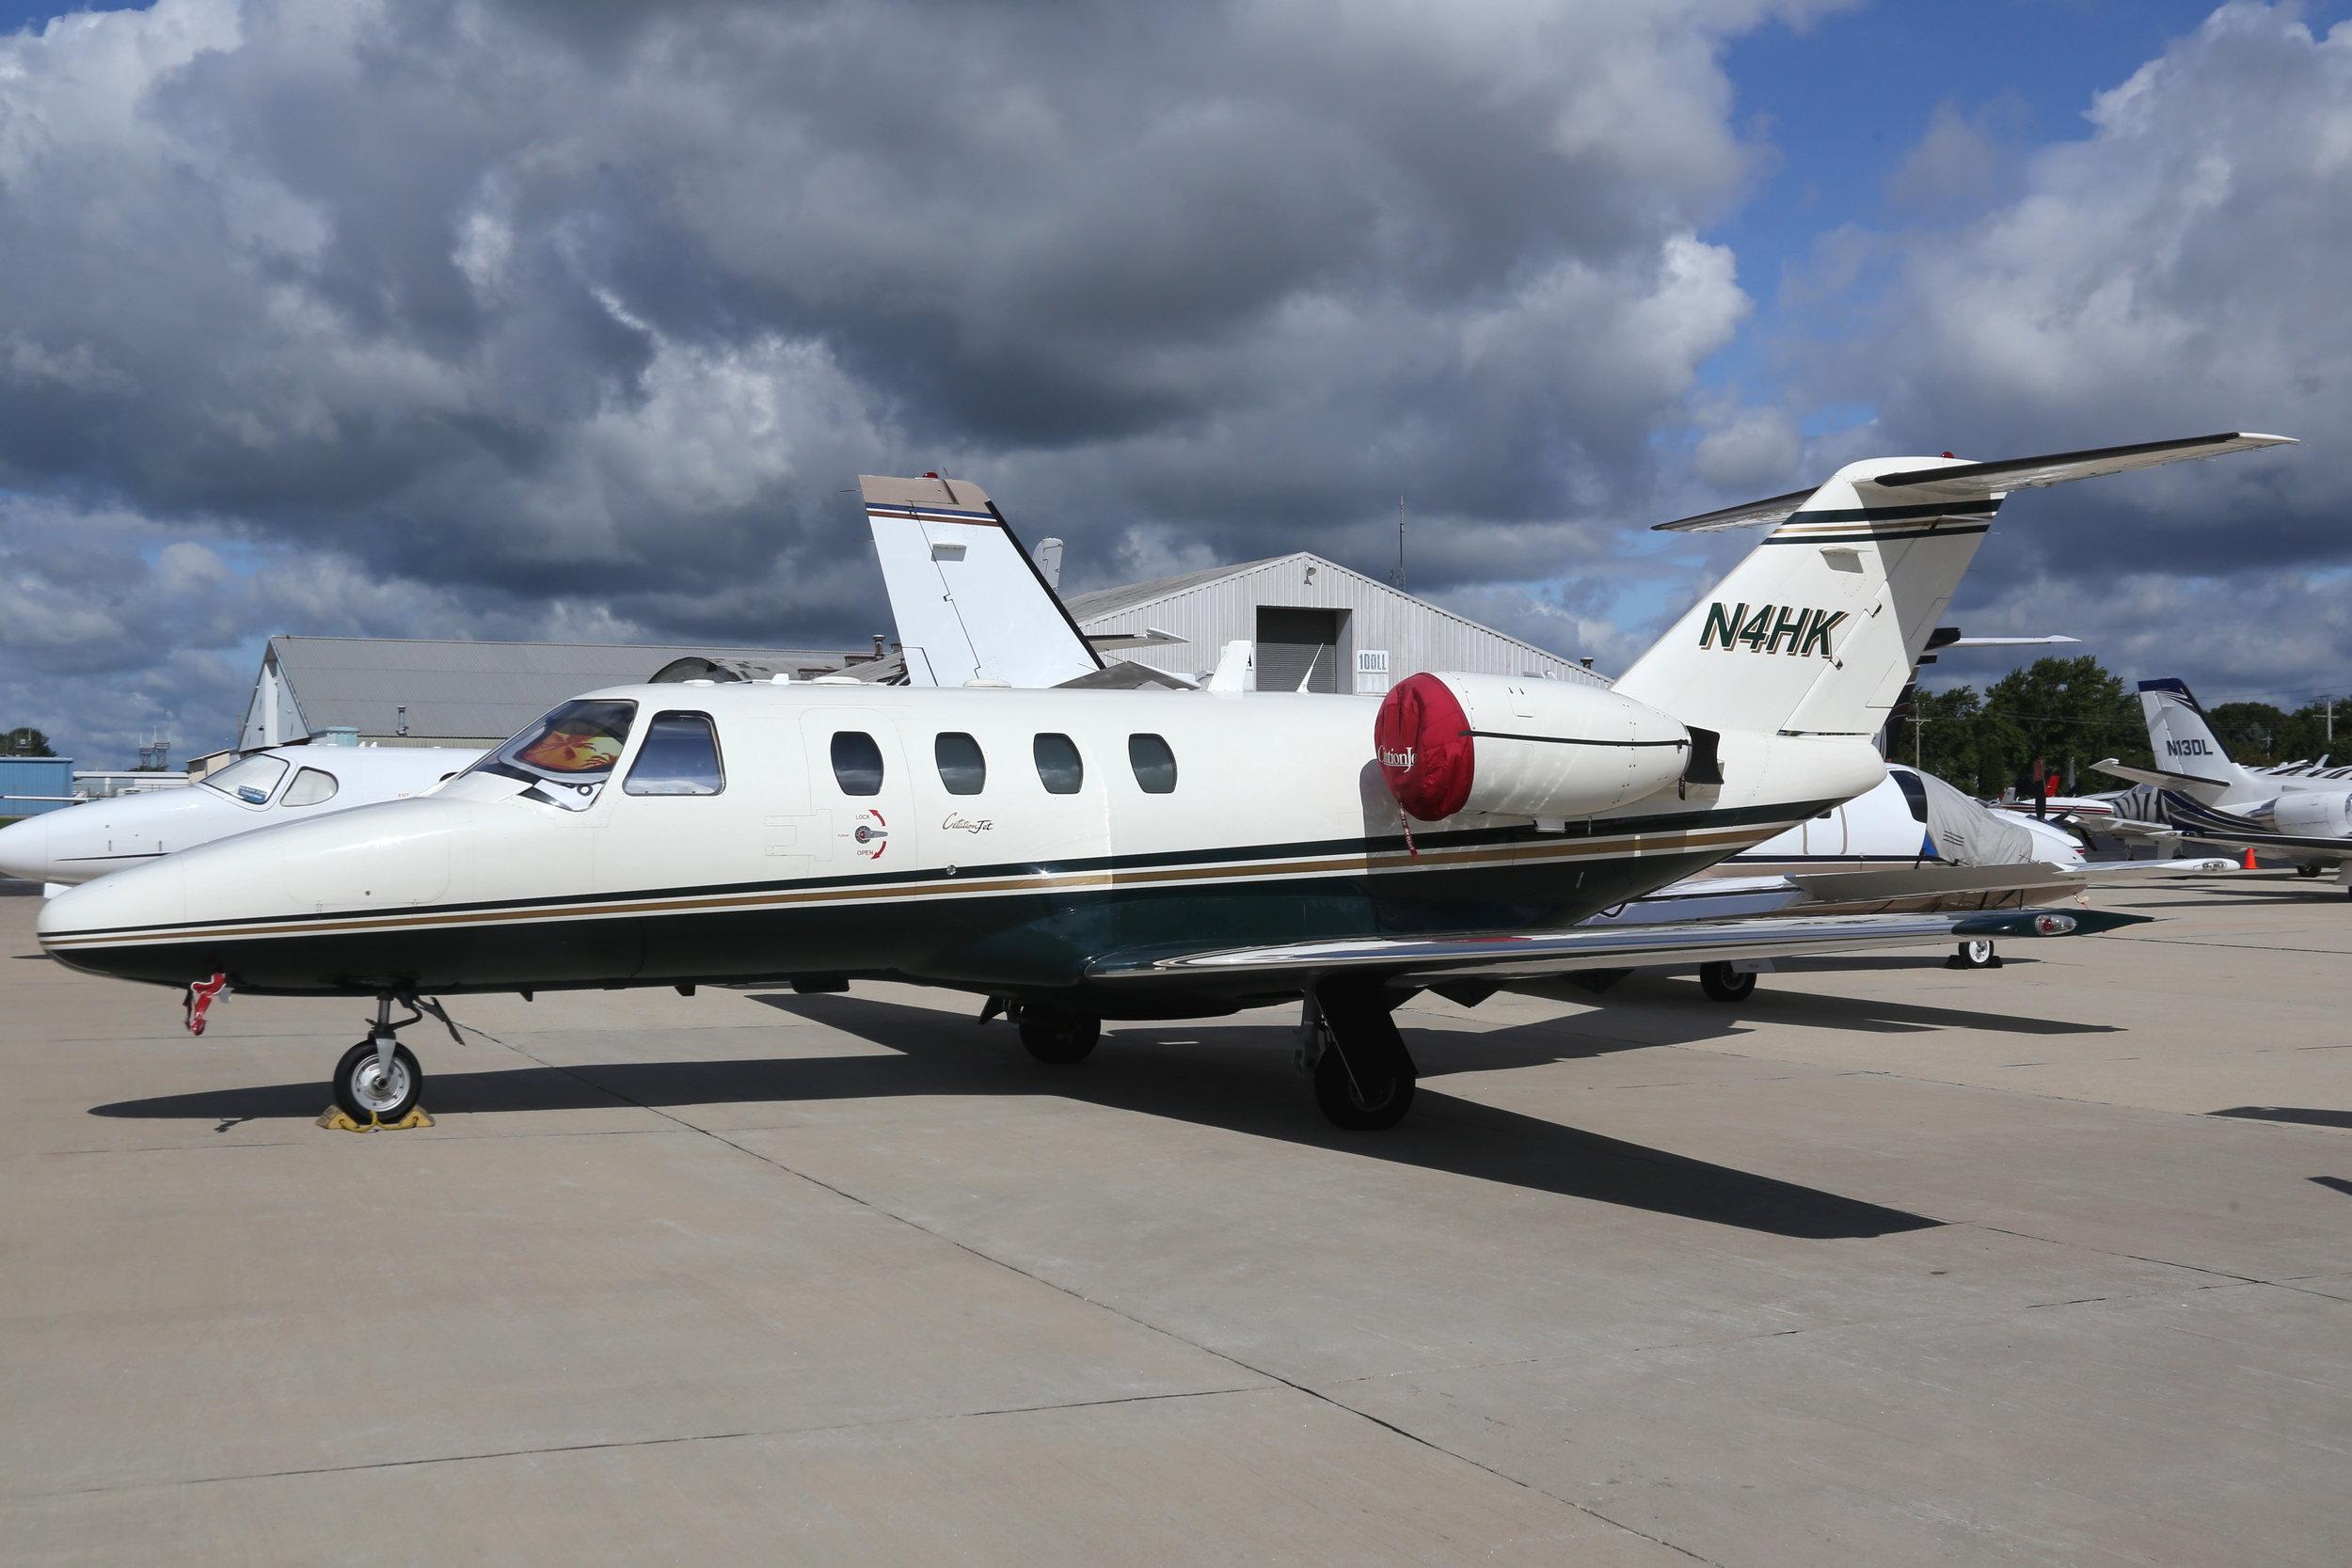 N4HK Cessna 550 taken at Whitman Regional Airport 26th July 2018 by John Wood